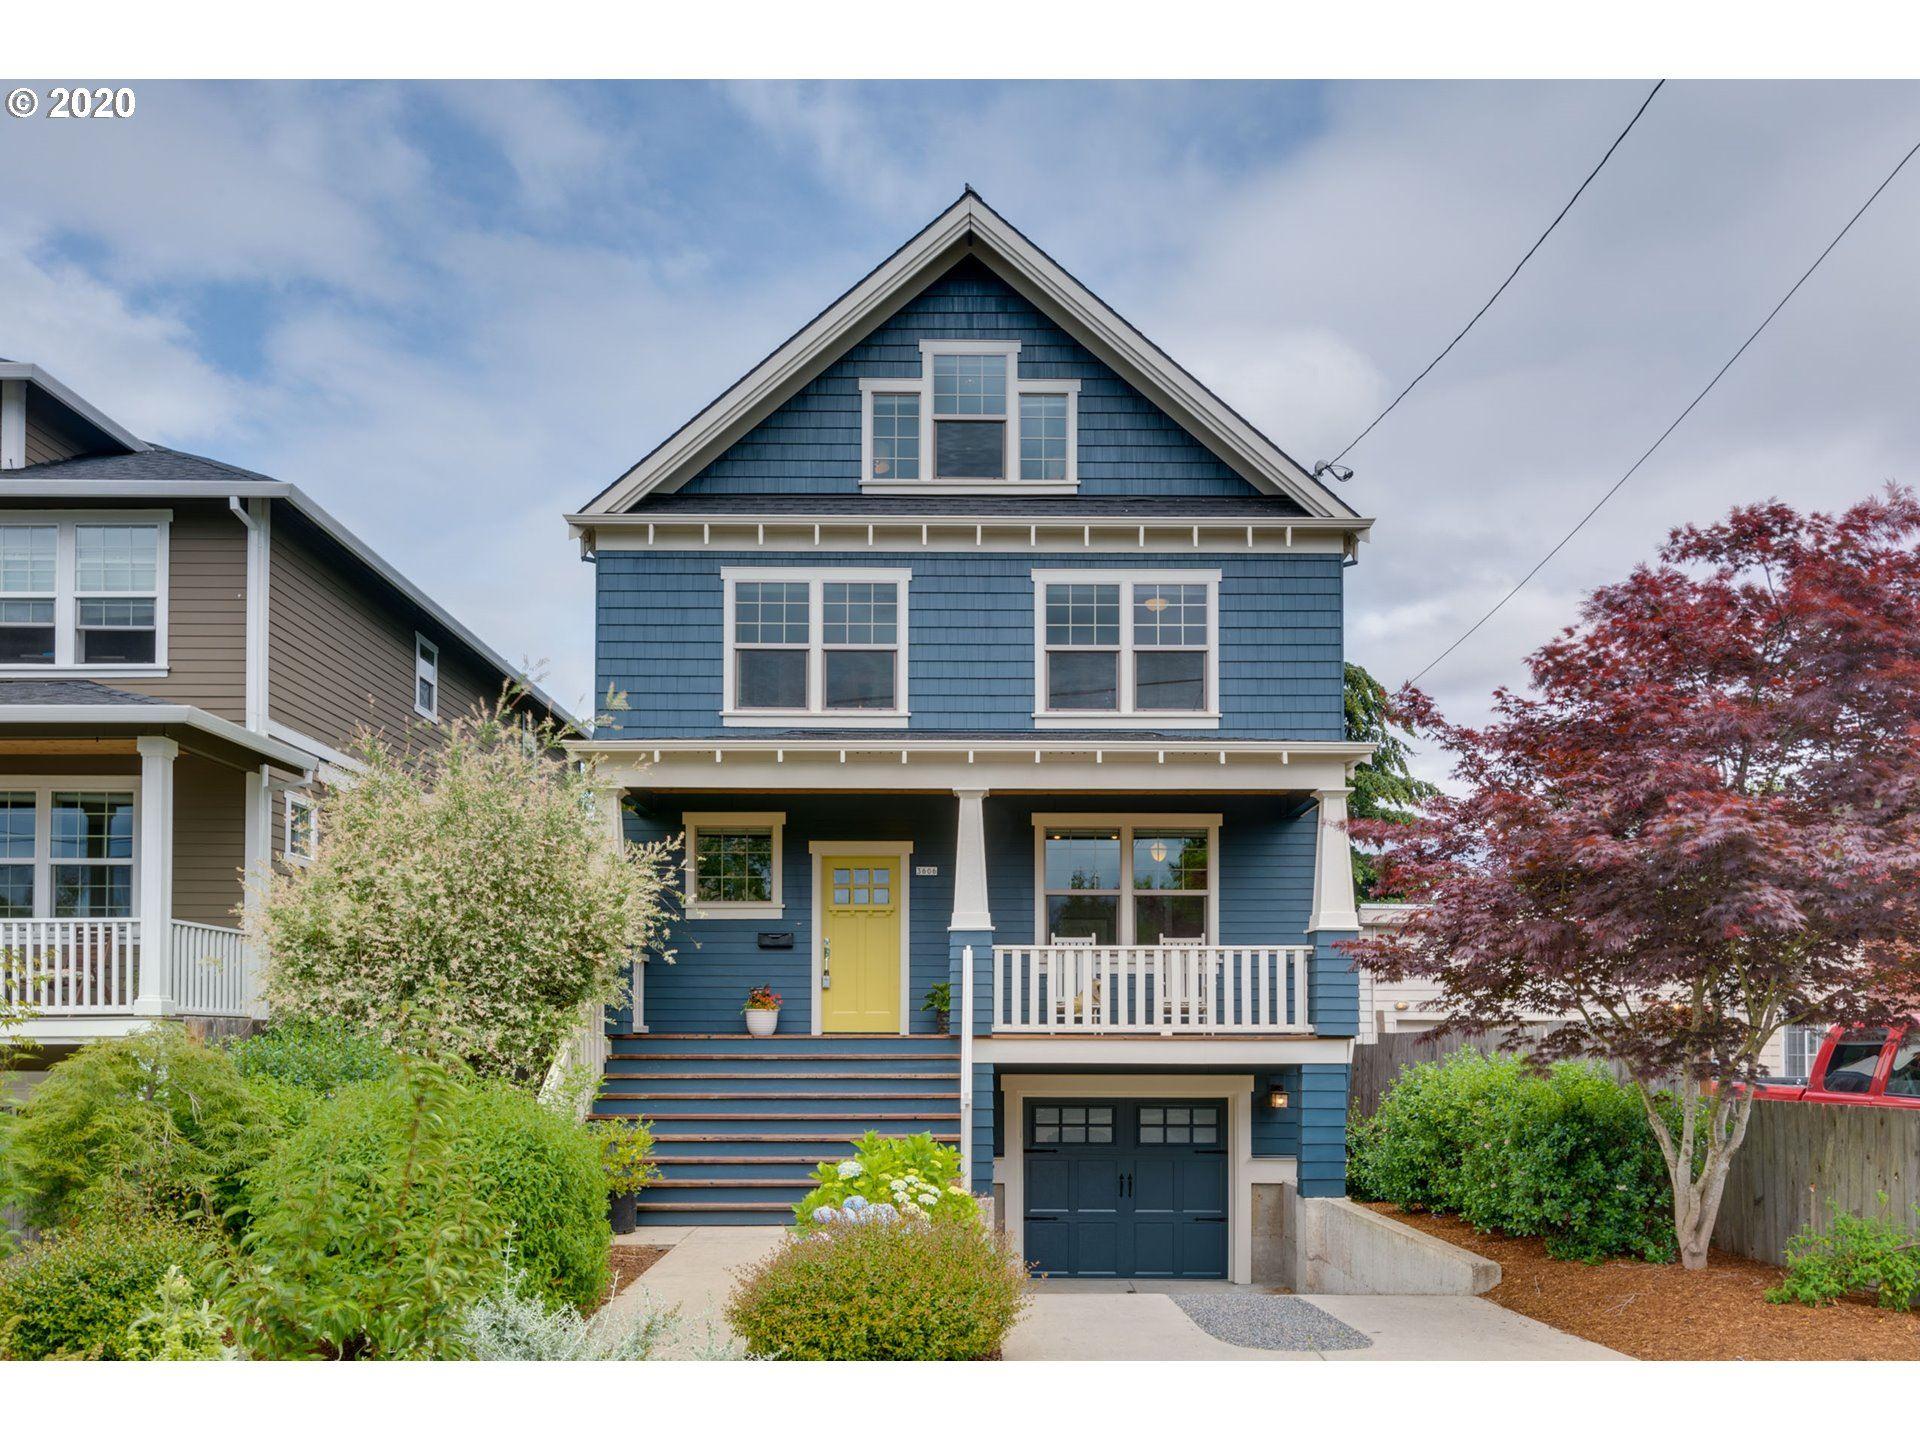 3606 NE 43RD AVE, Portland, OR 97213 - MLS#: 20173576